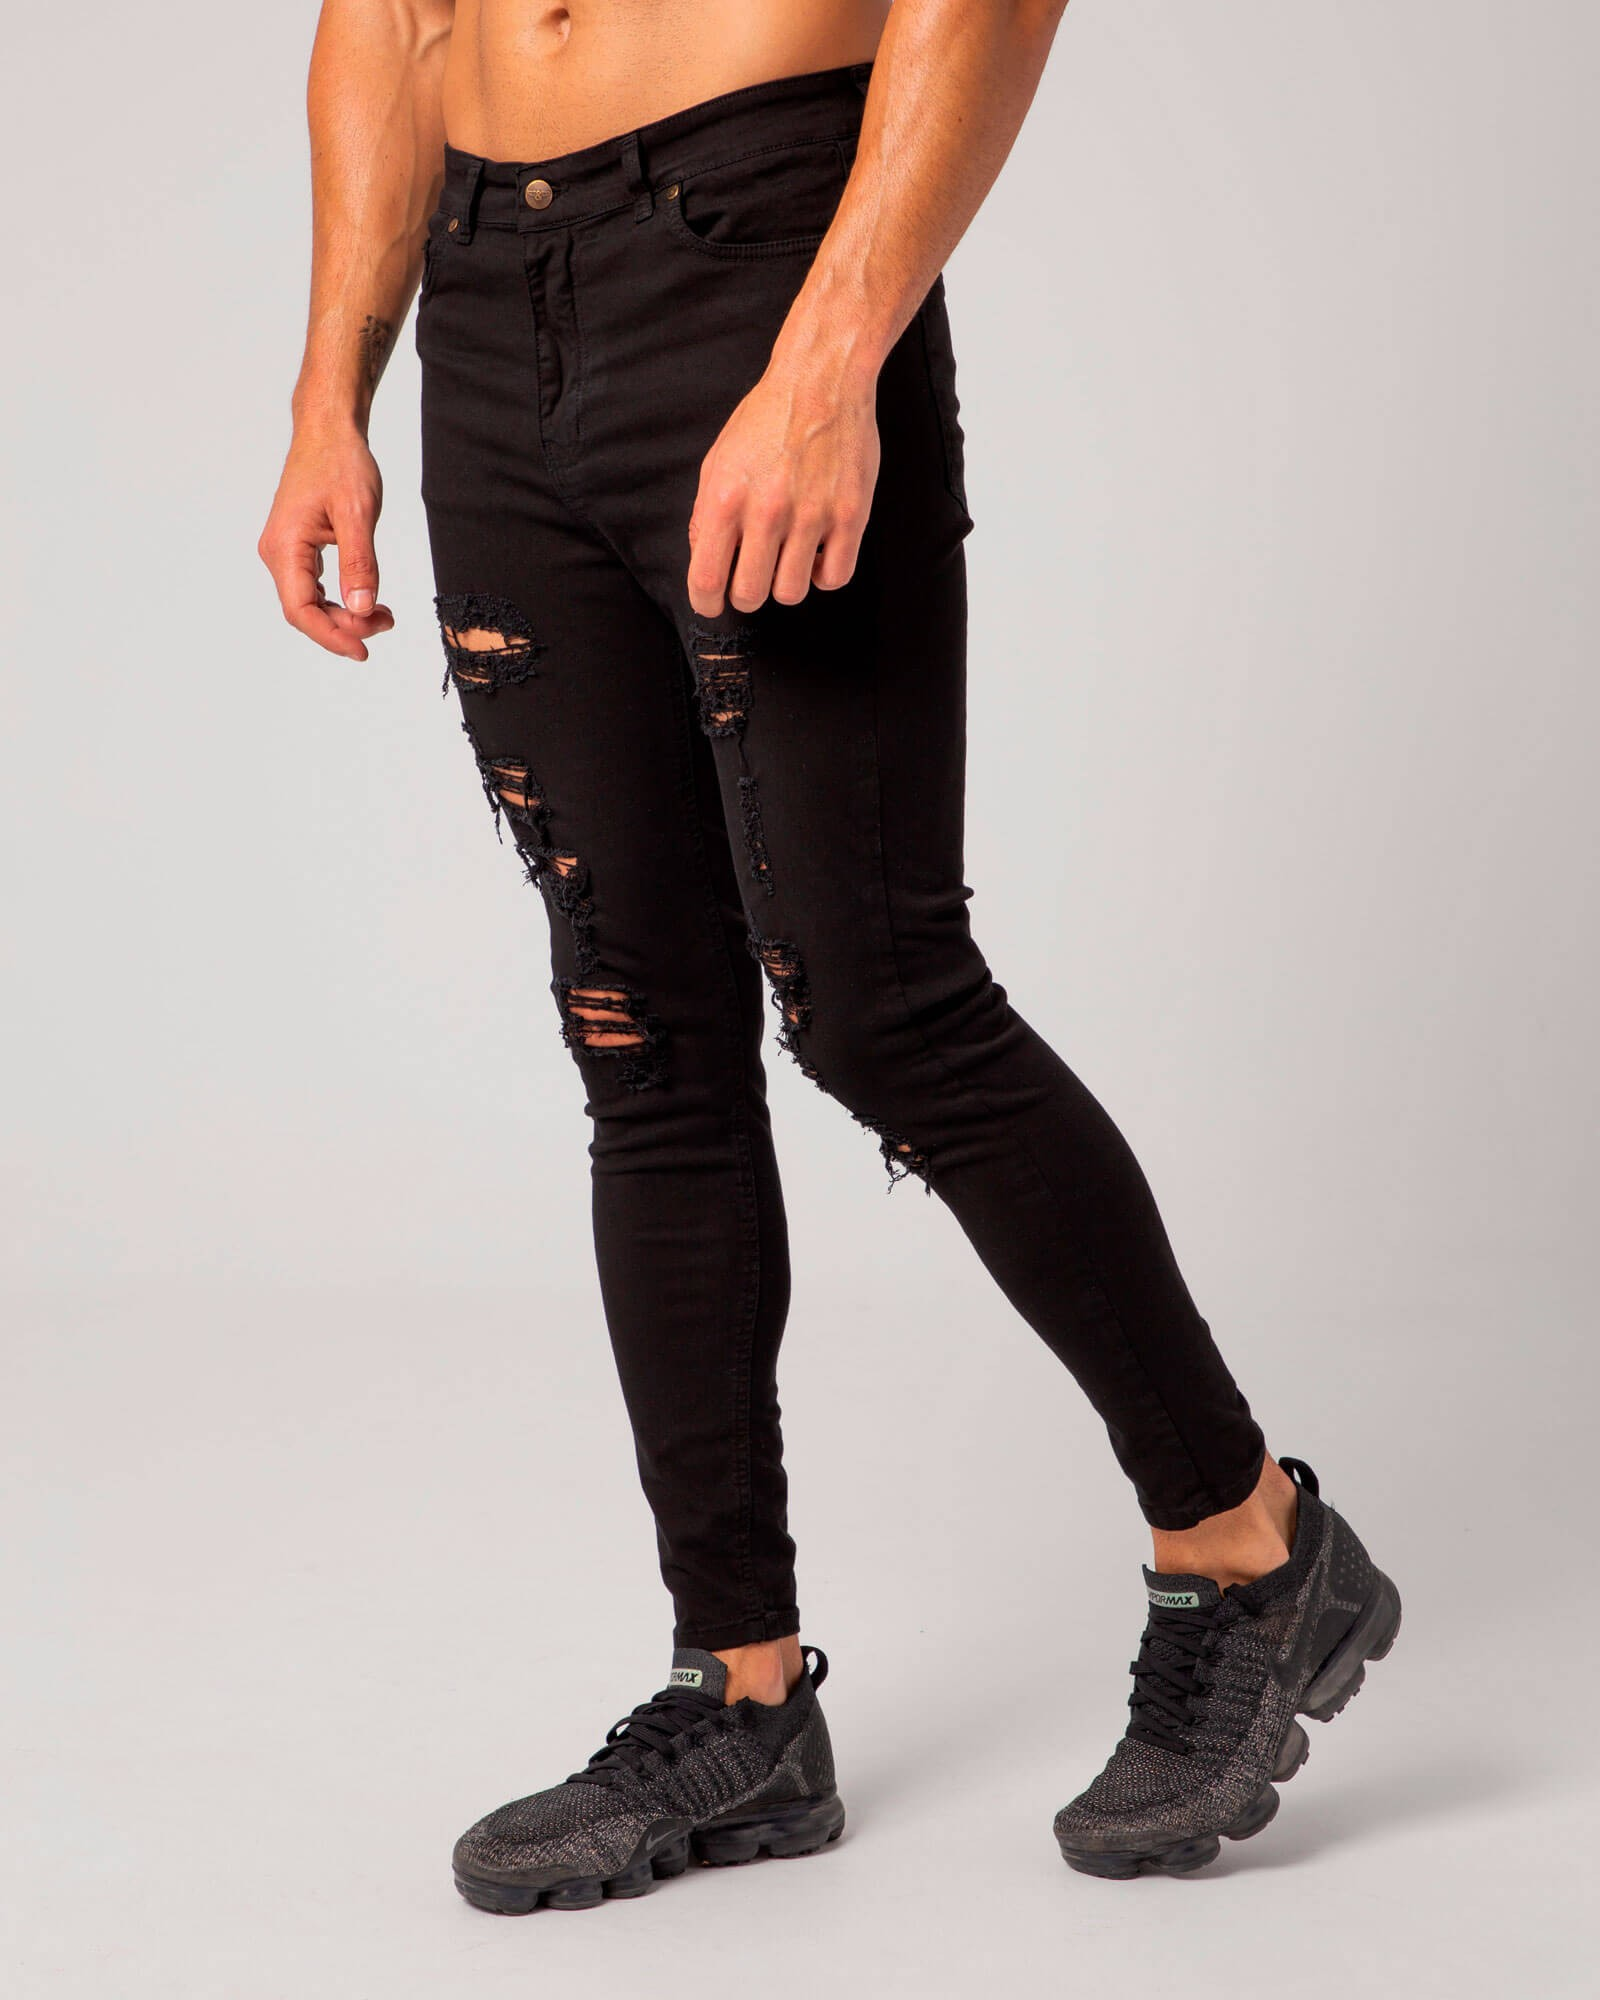 Ripped Acid Denim Jeans. Estilo urbano de la marca ELIU streetwear.